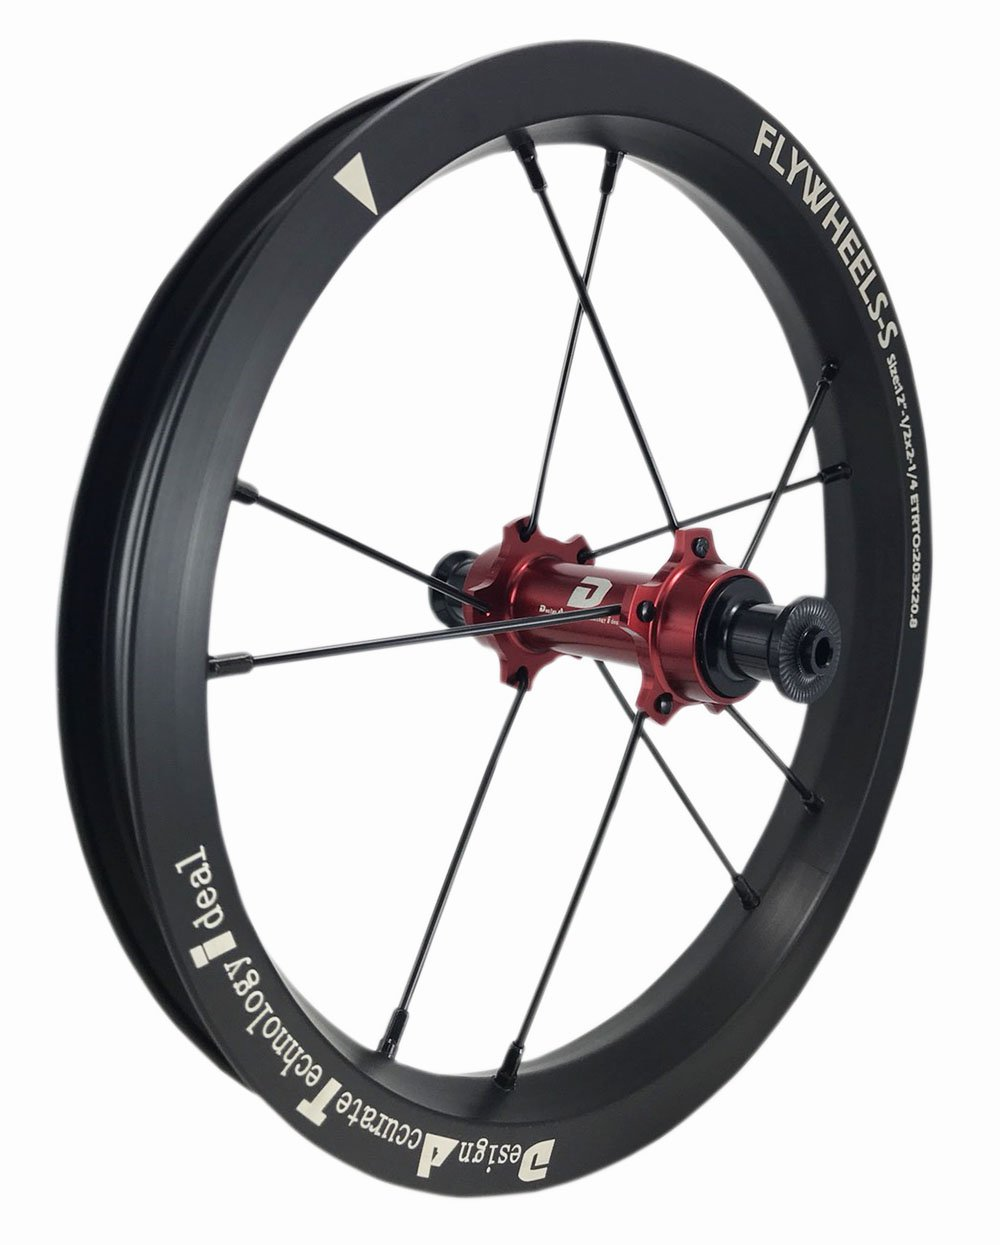 DATI 12インチ S7X-W Alloy レース レベル. 低抵抗.スムーズ.バランスバイク Kids Balance Bike Bicycle Super light 子供自転車ホイール B07DKFS64N BIXBI PUKY: 90*10MM|赤 赤 BIXBI PUKY: 90*10MM